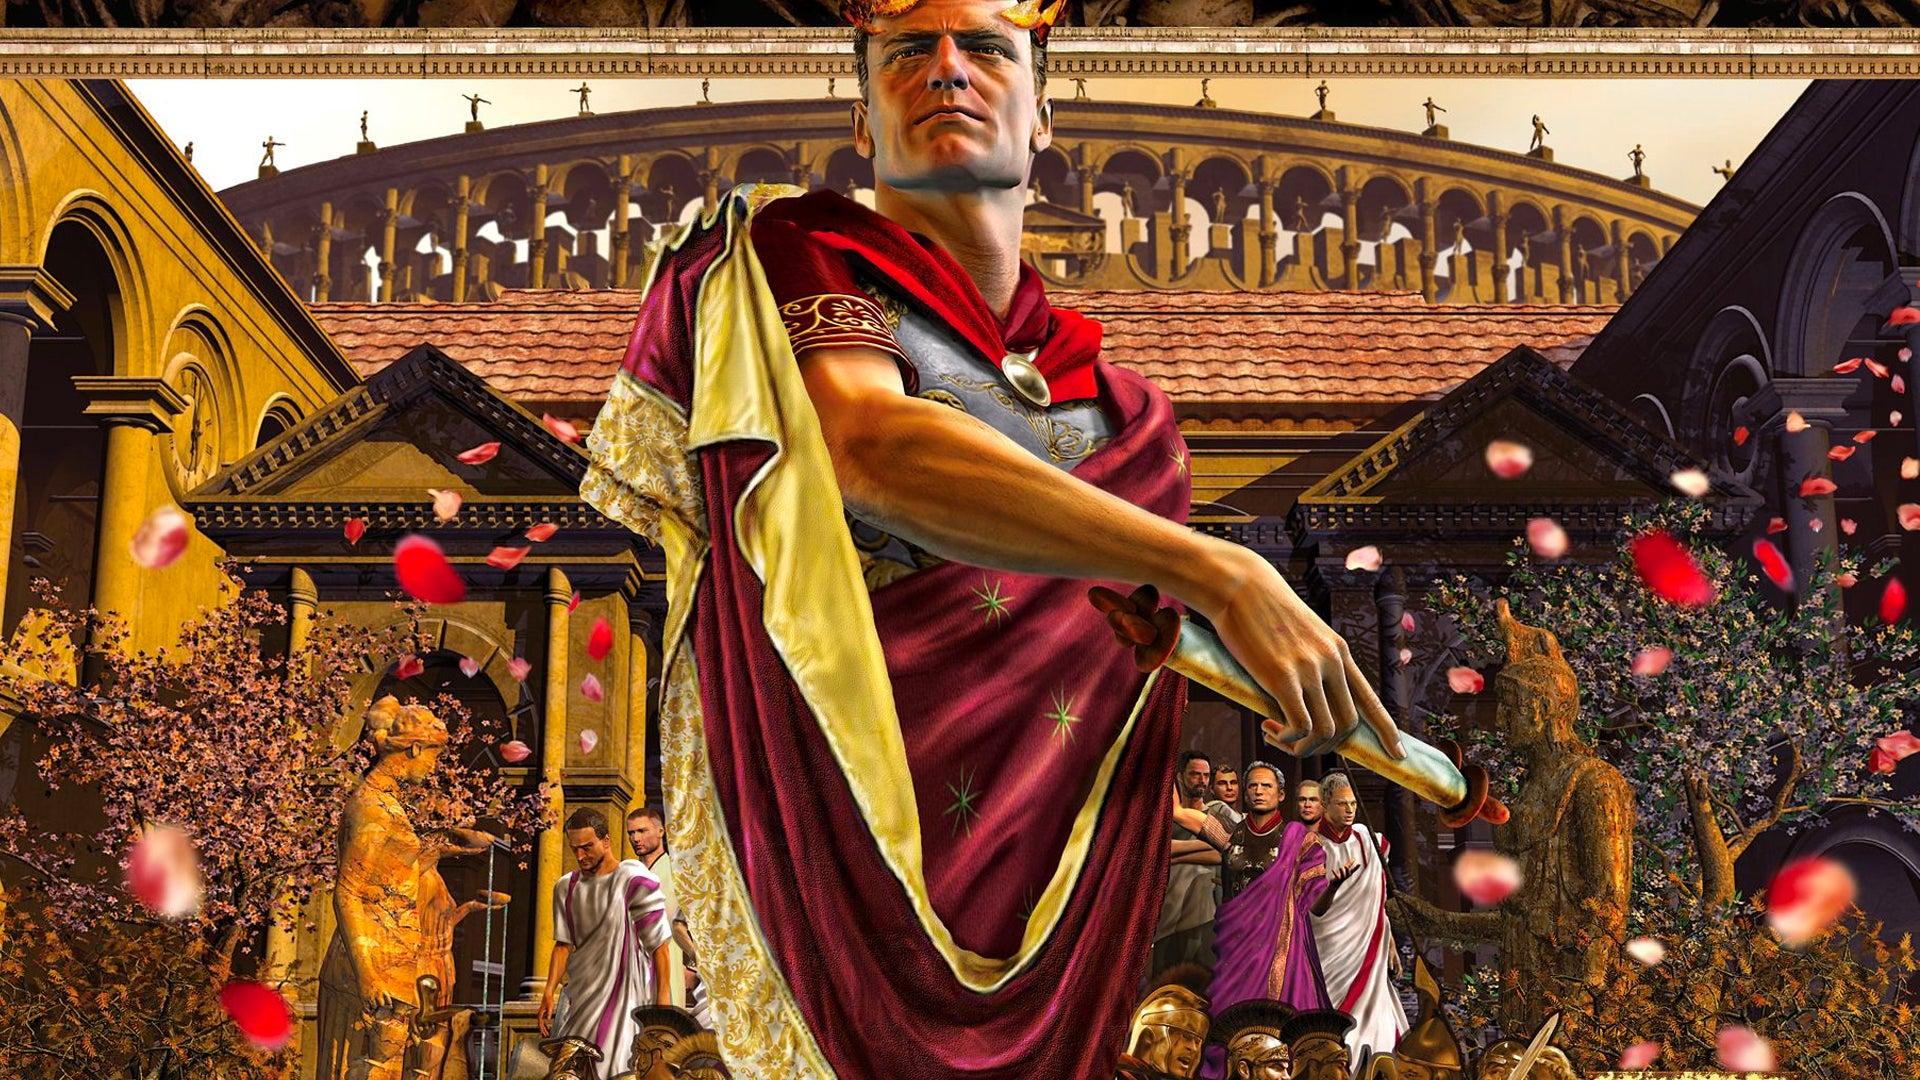 republic-of-rome-board-game-artwork.jpg